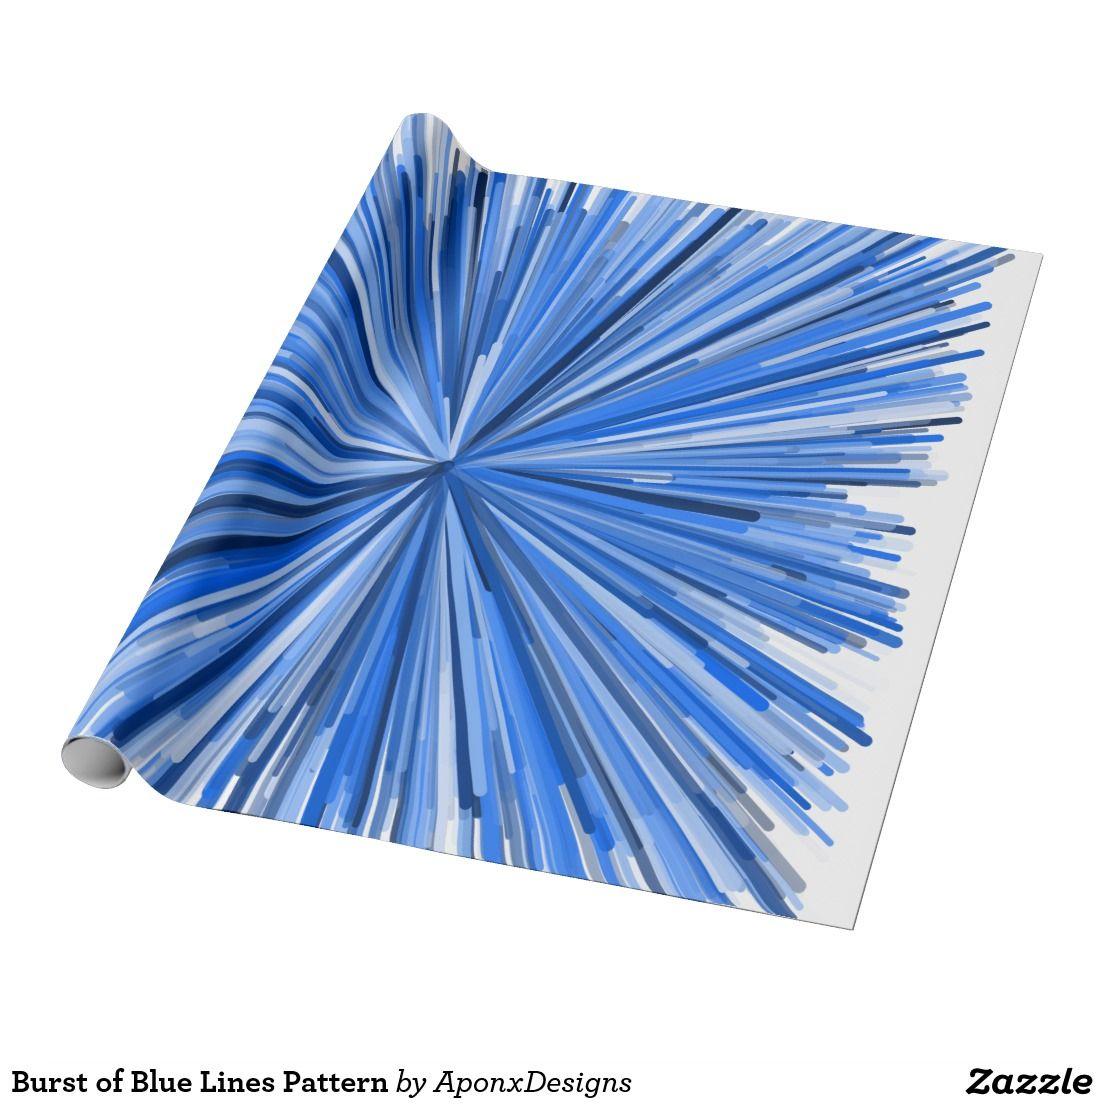 Burst of Blue Lines Pattern